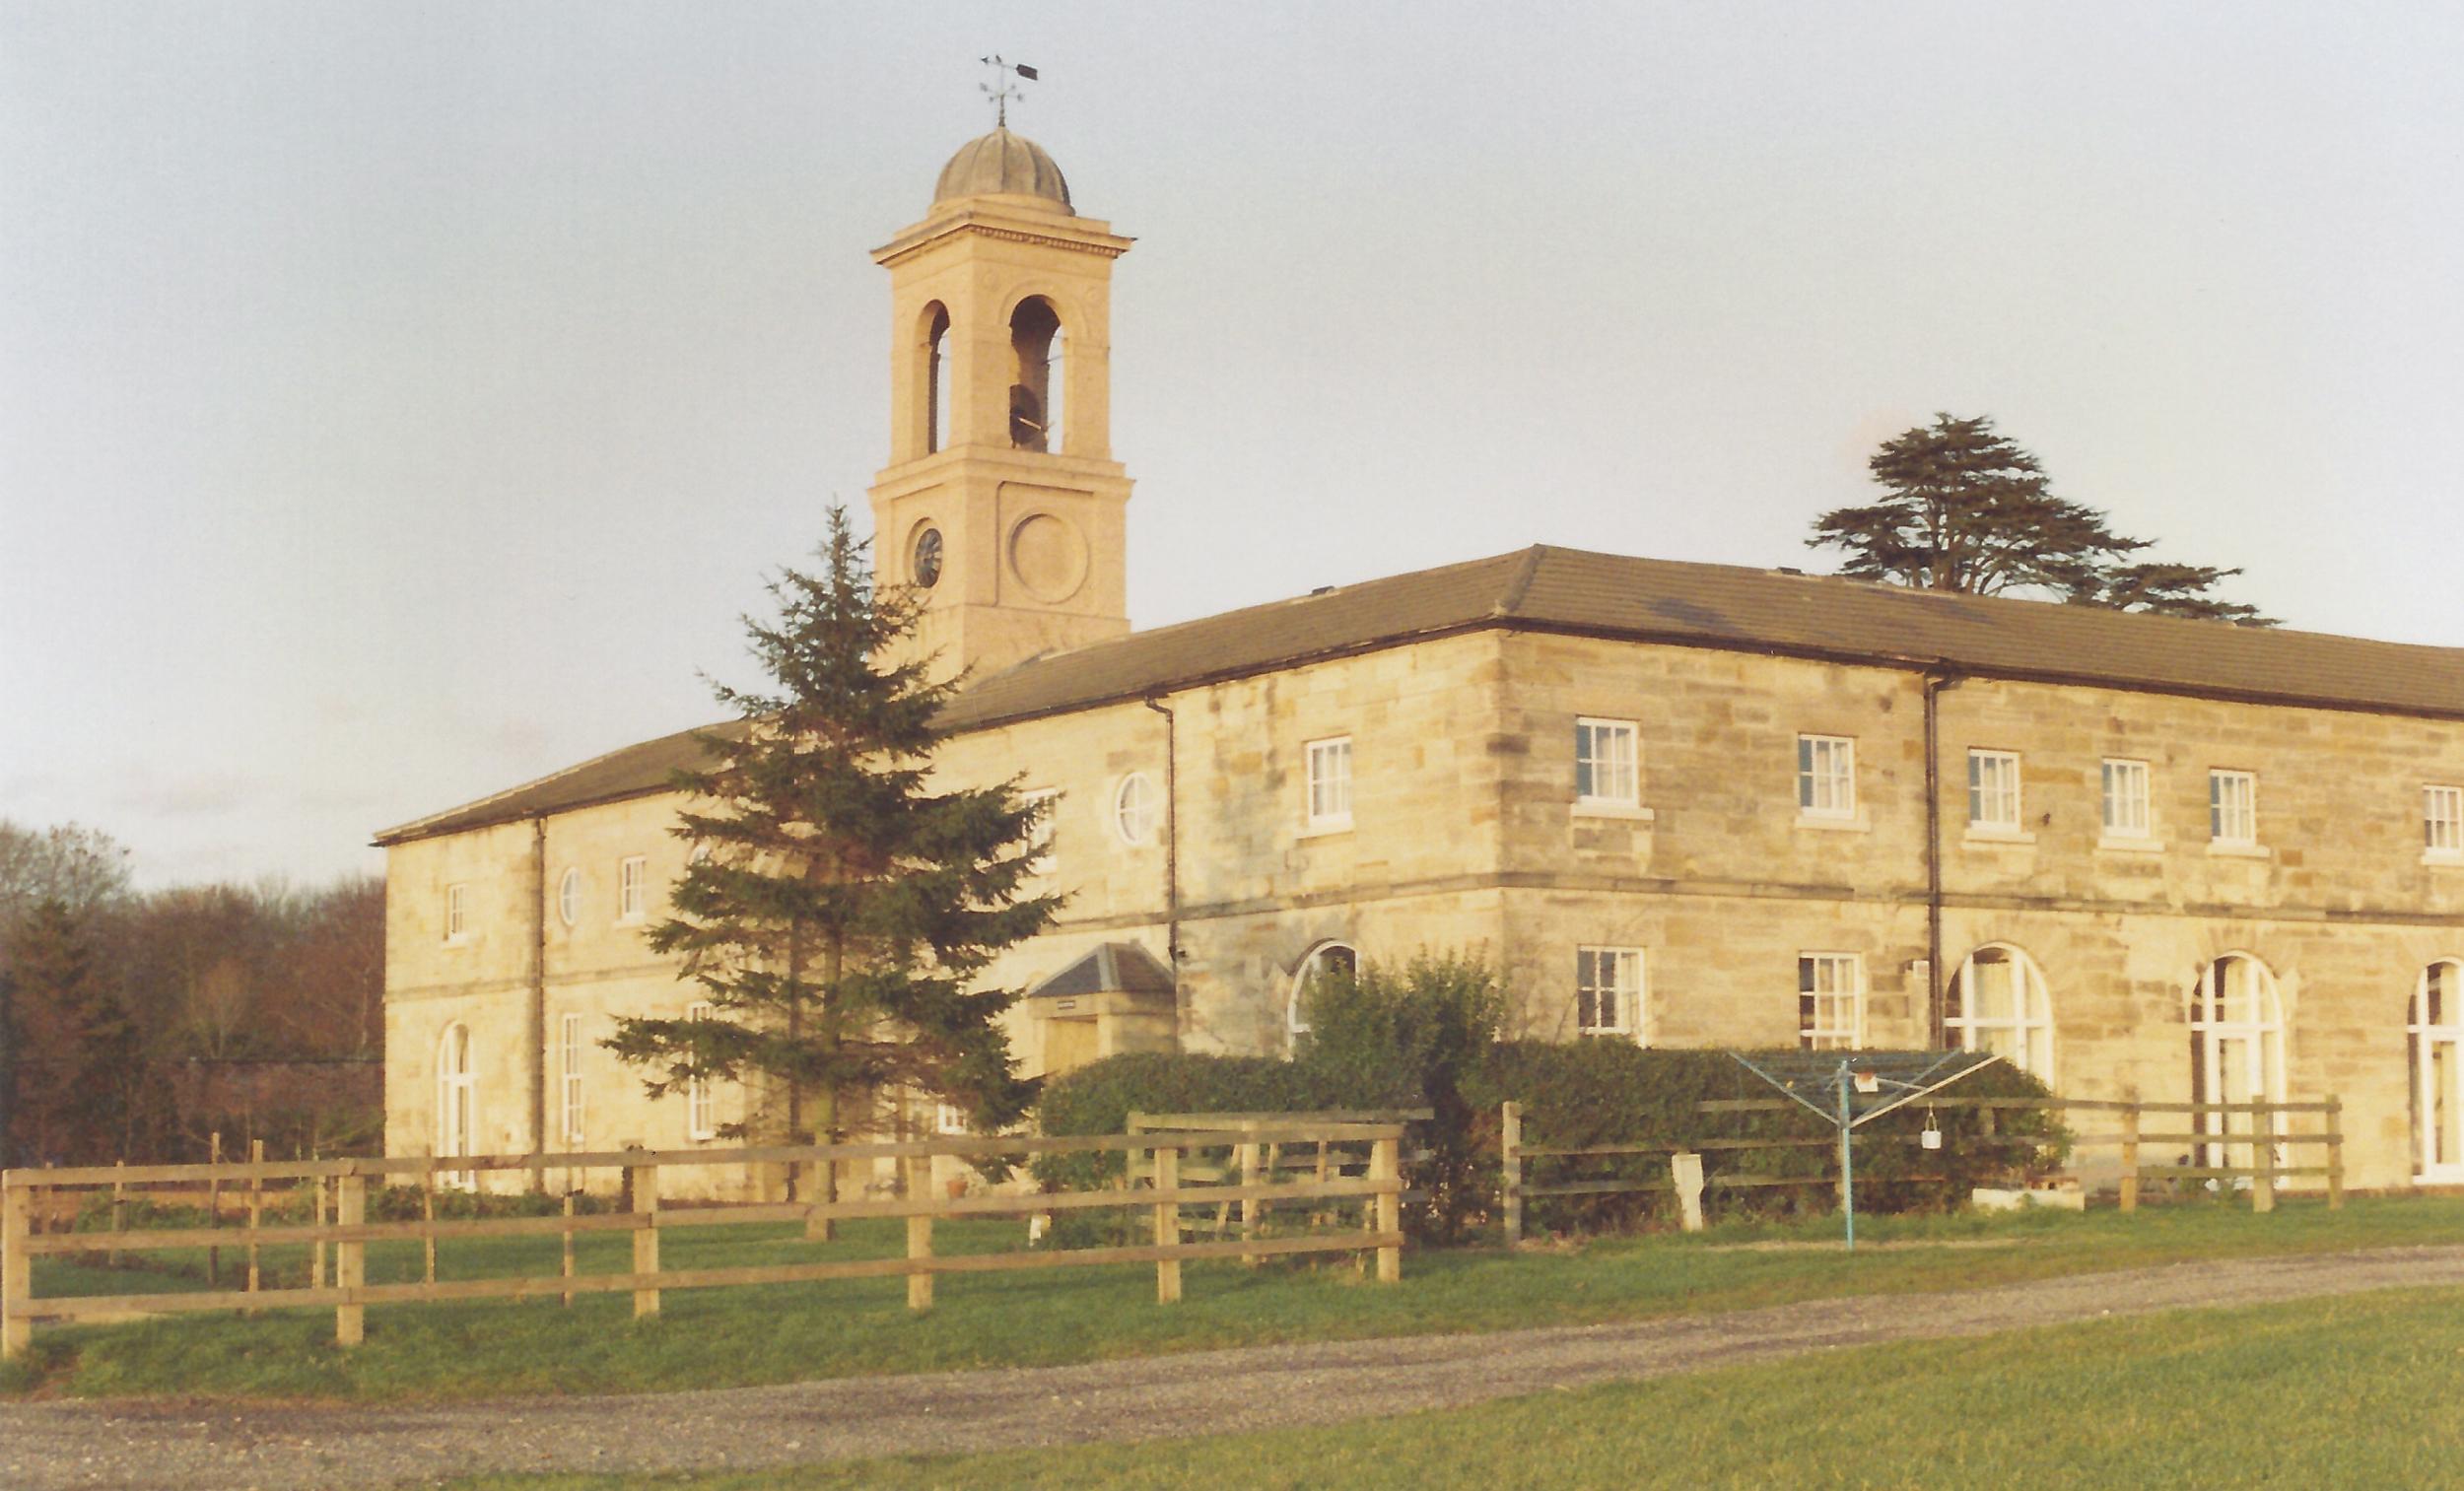 Thirkleby Hall